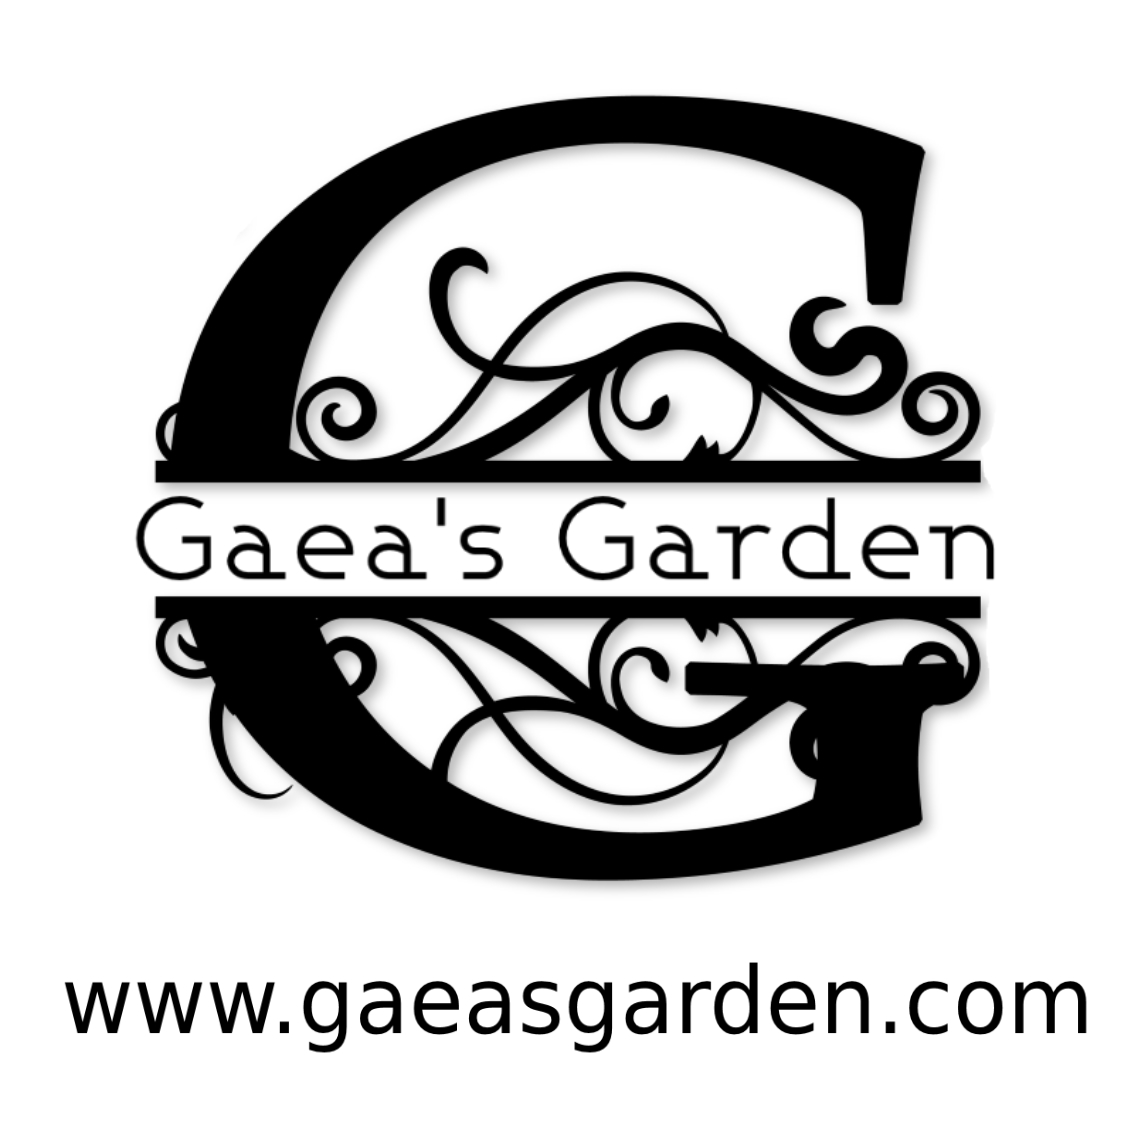 gg logo with webaddress